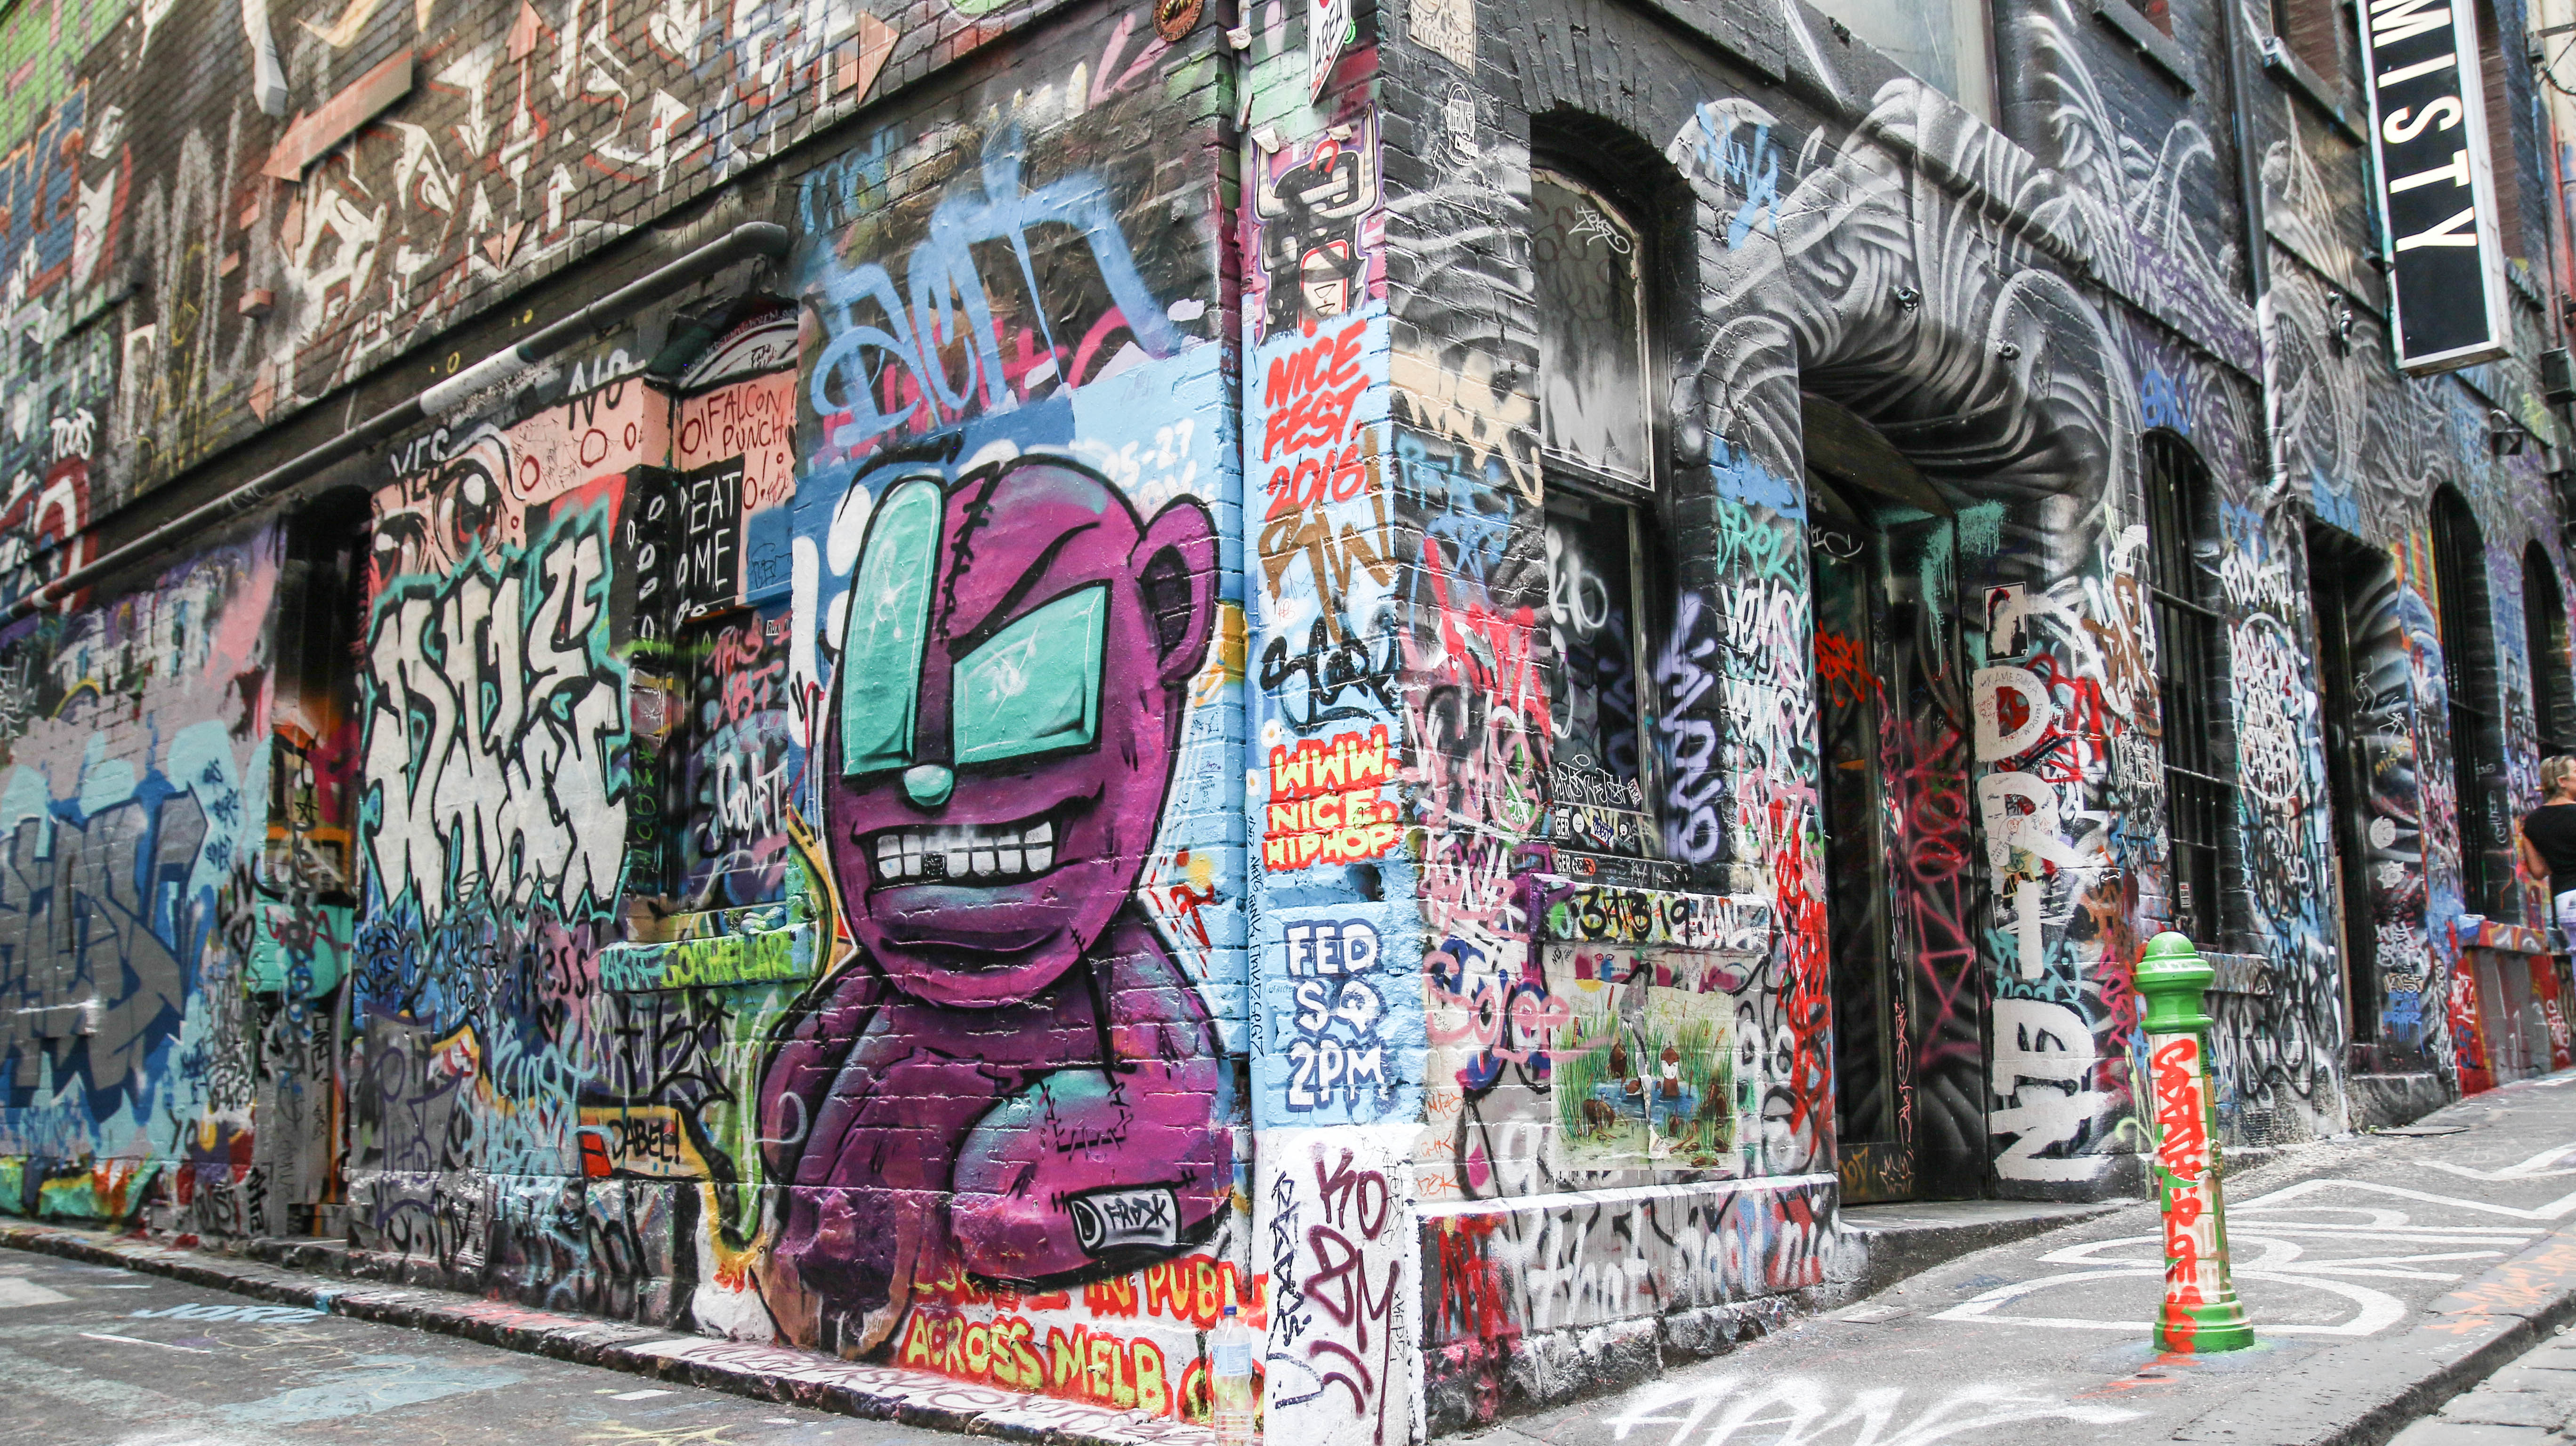 Hosier Lane Graffiti and bordered up walls - JamesWatling KiwiPassport.com